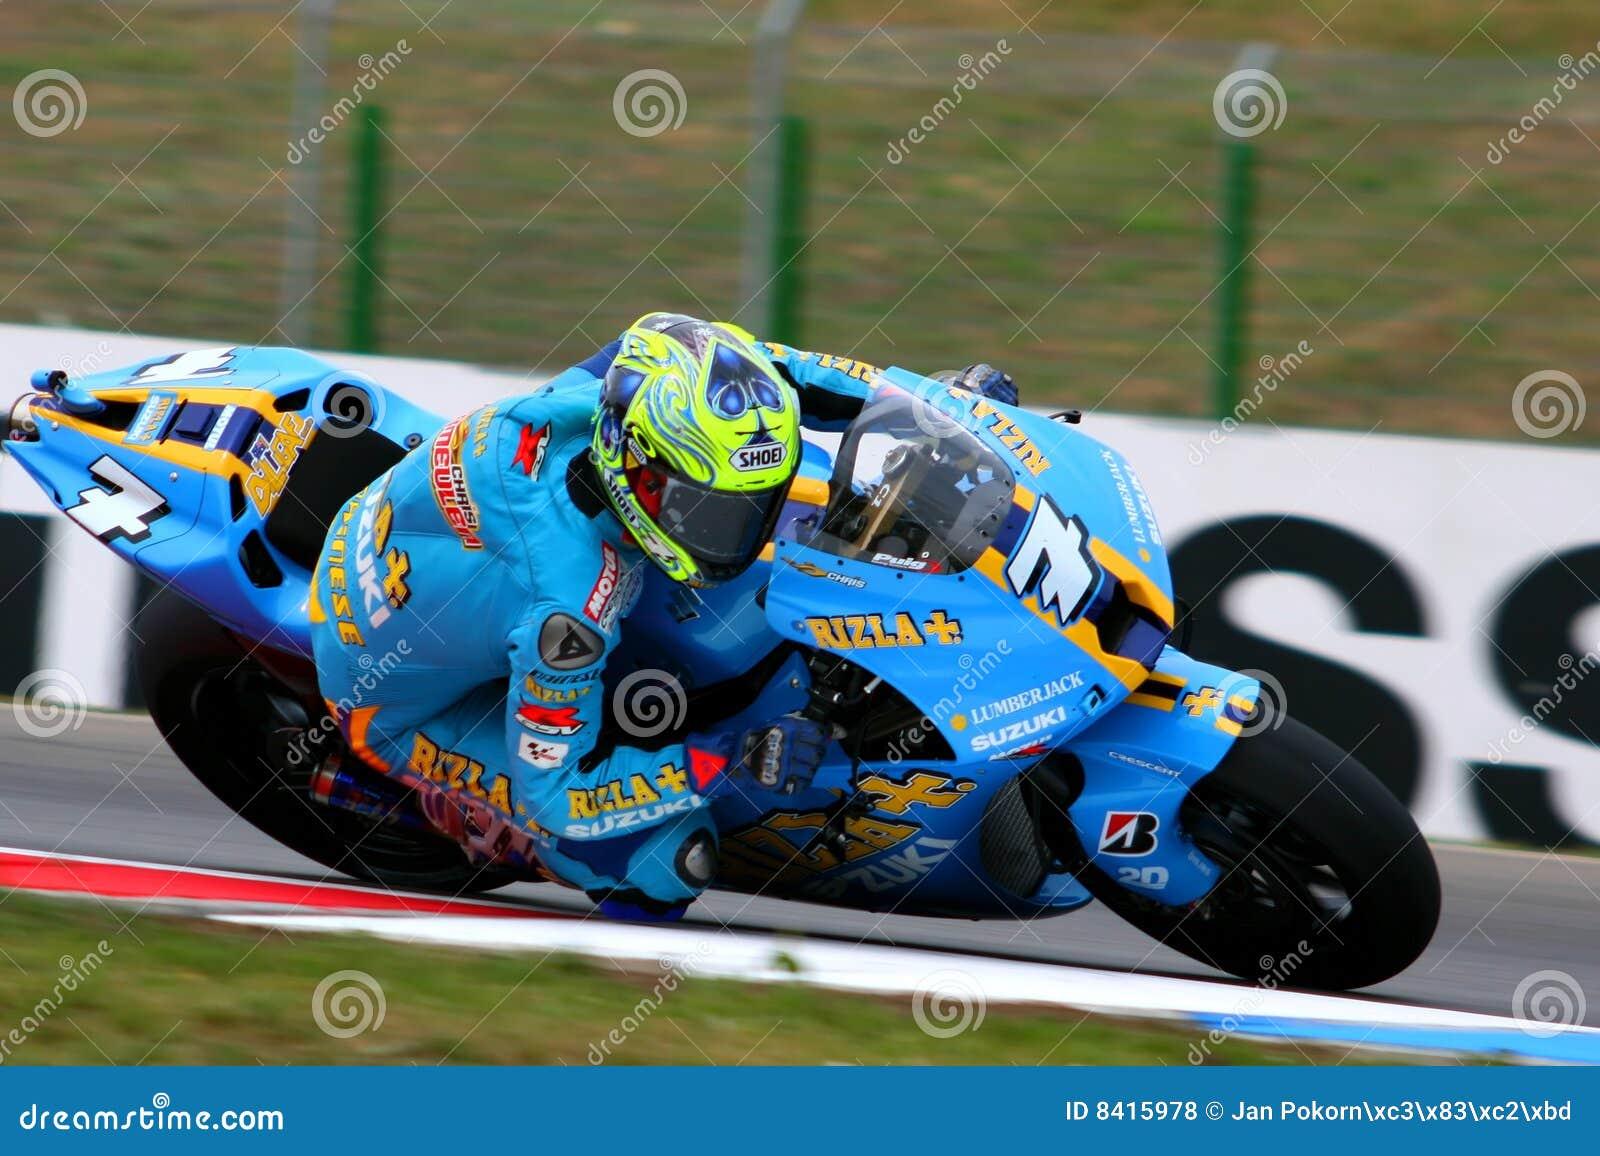 7 Chris Vermeulen - Rizla Suzuki MotoGP Editorial Stock Photo - Image: 8415978